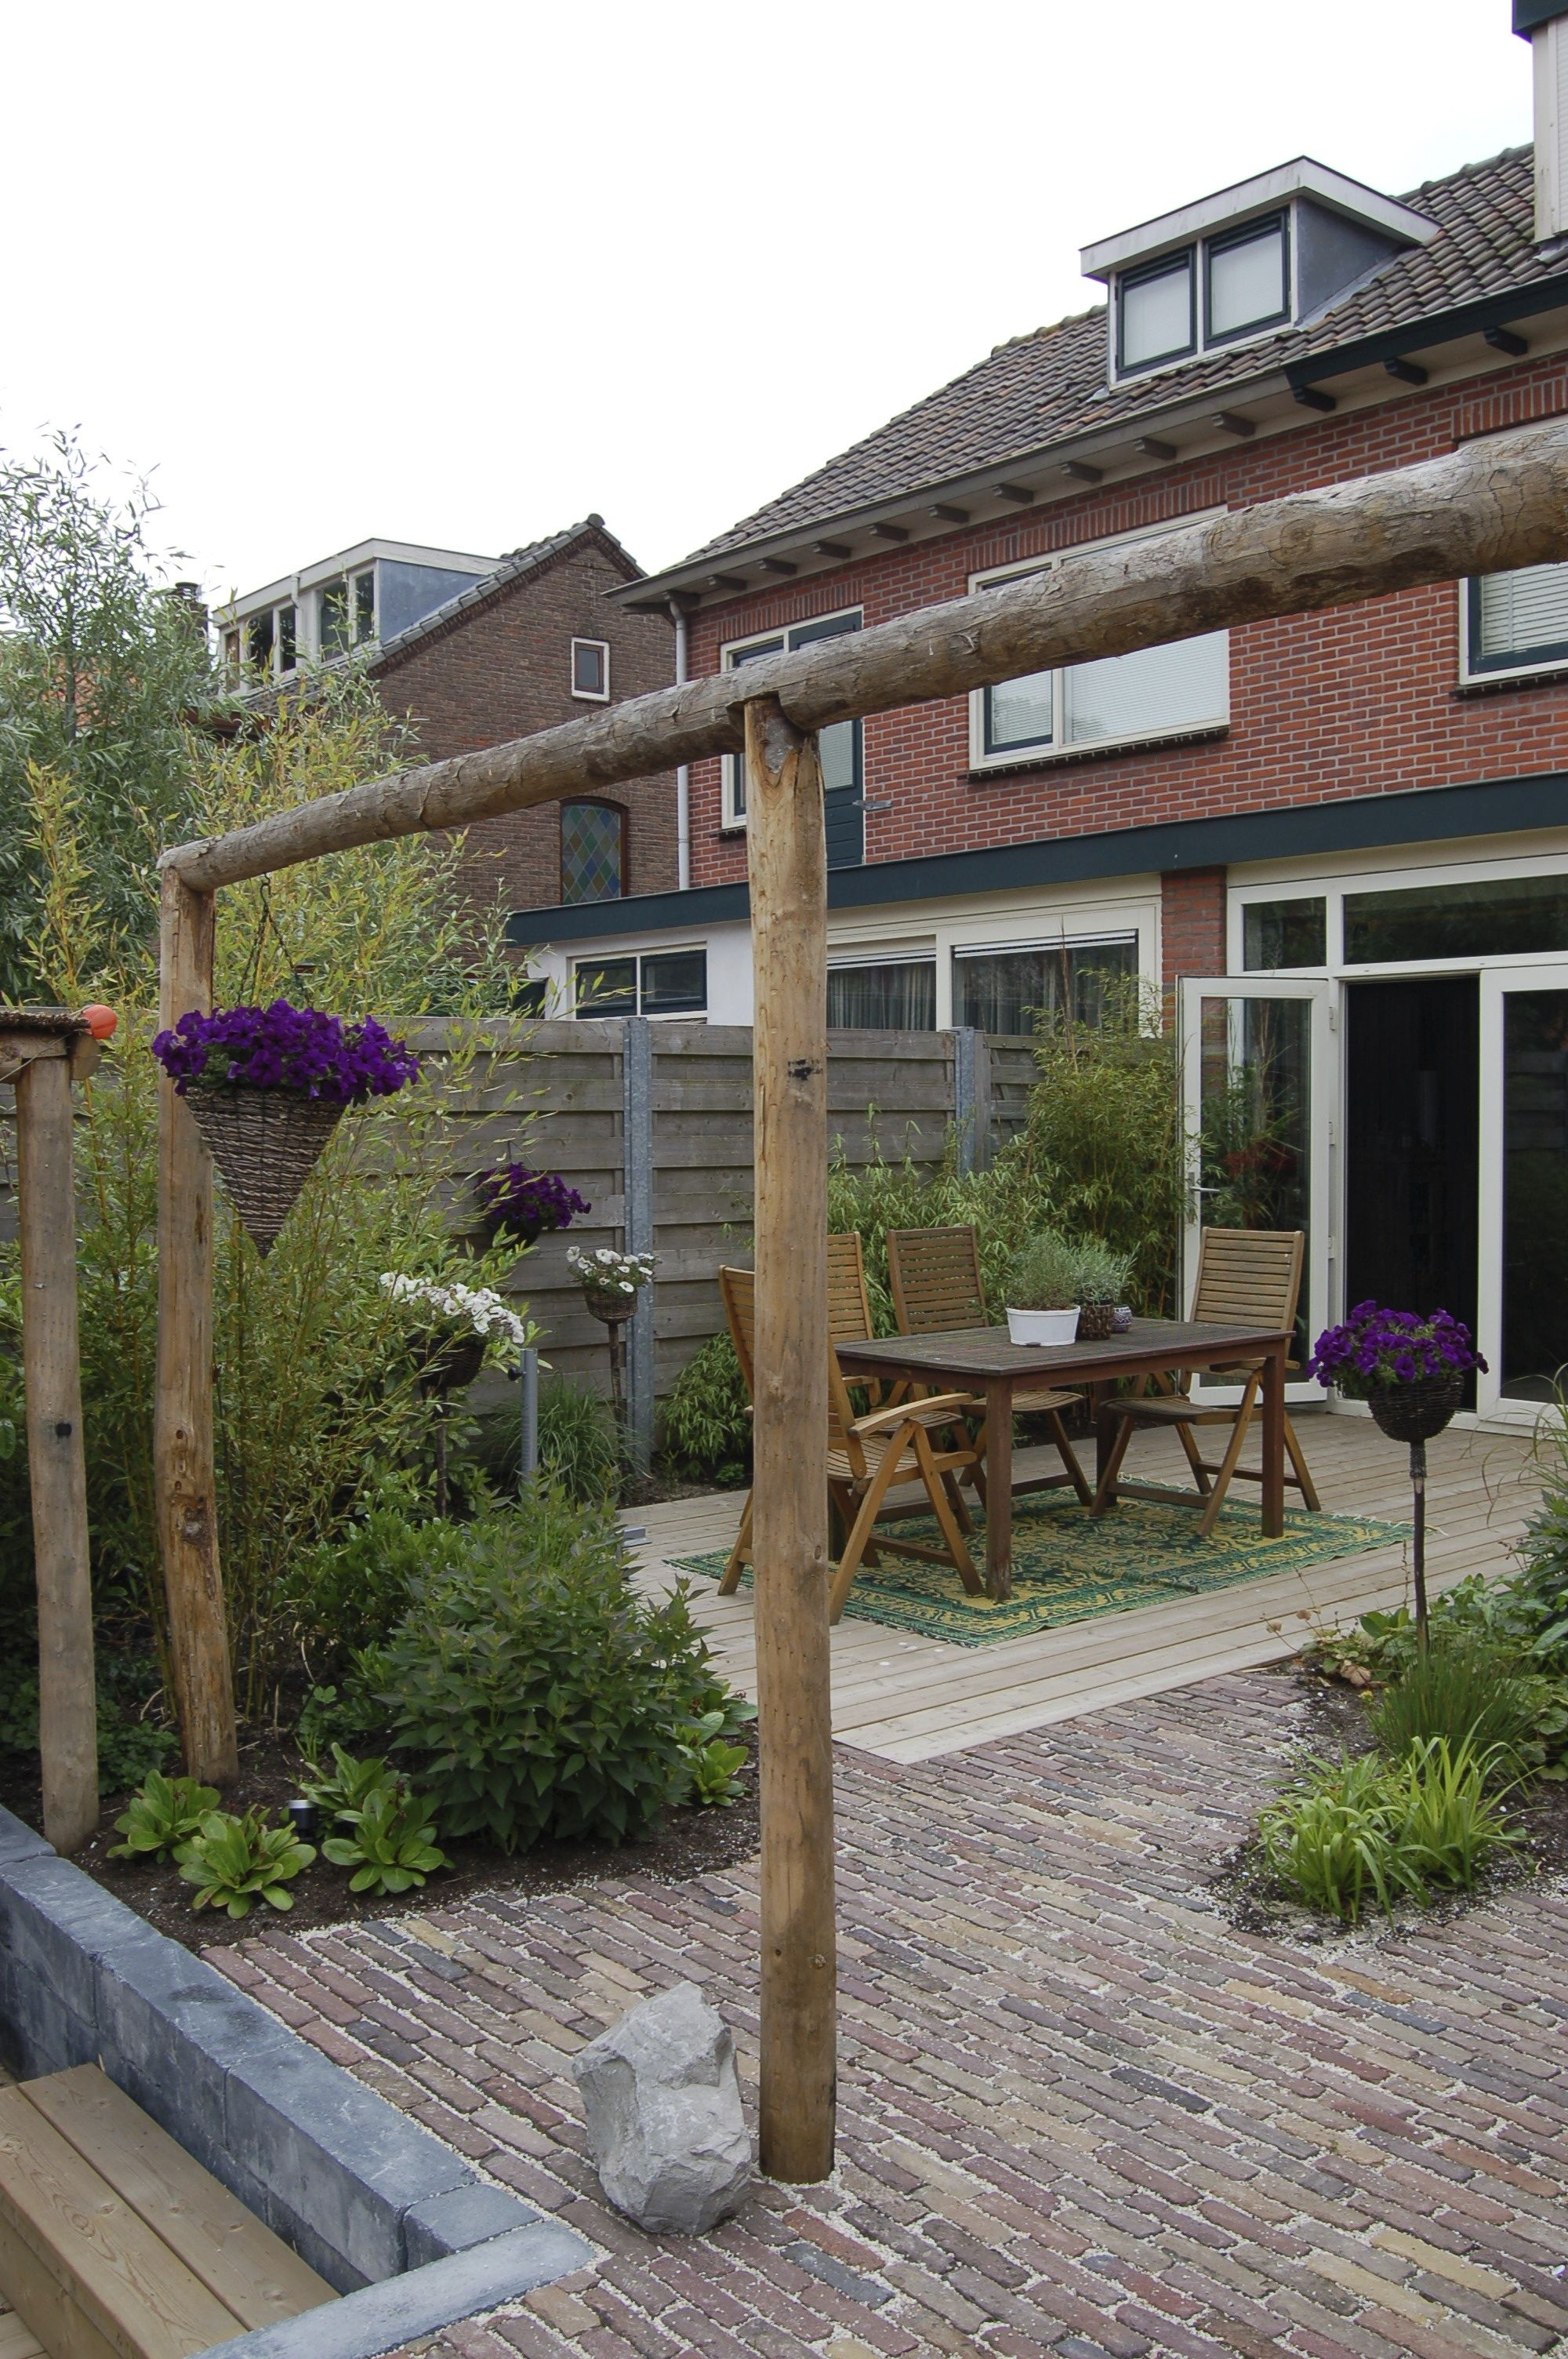 Achtertuin met overdekte zitkuil wintergroene beplanting en pergola van kastanjehout www - Overdekte patio pergola ...